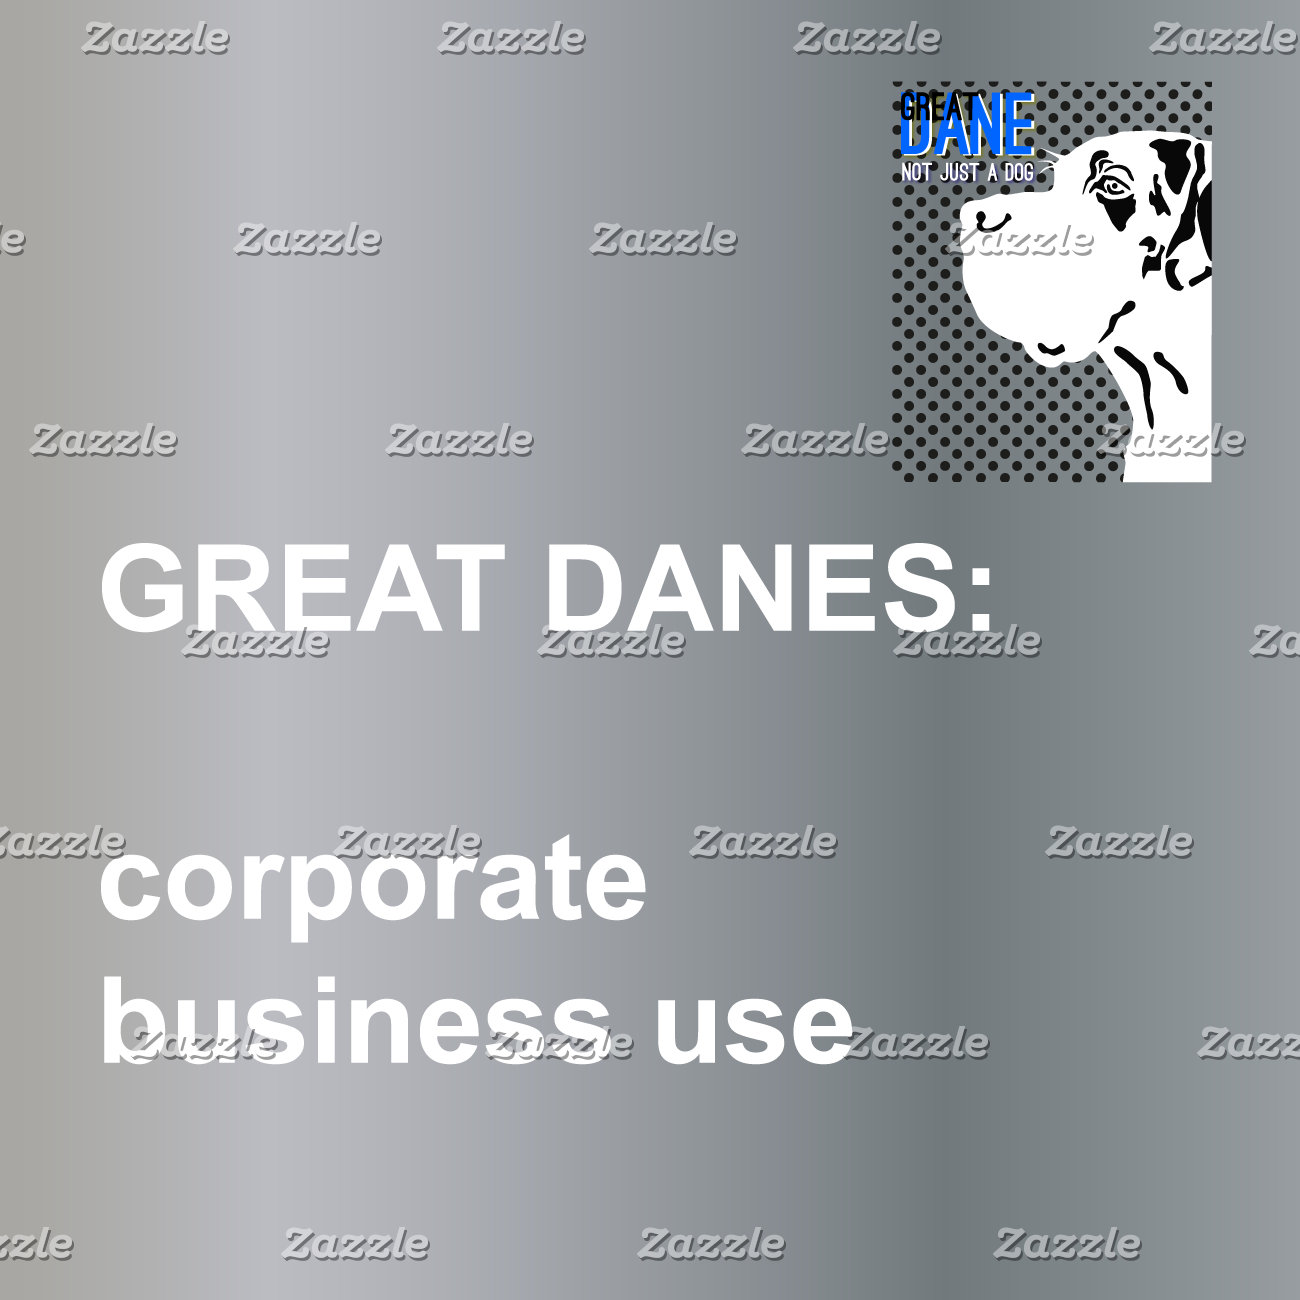 Corporate Great Danes